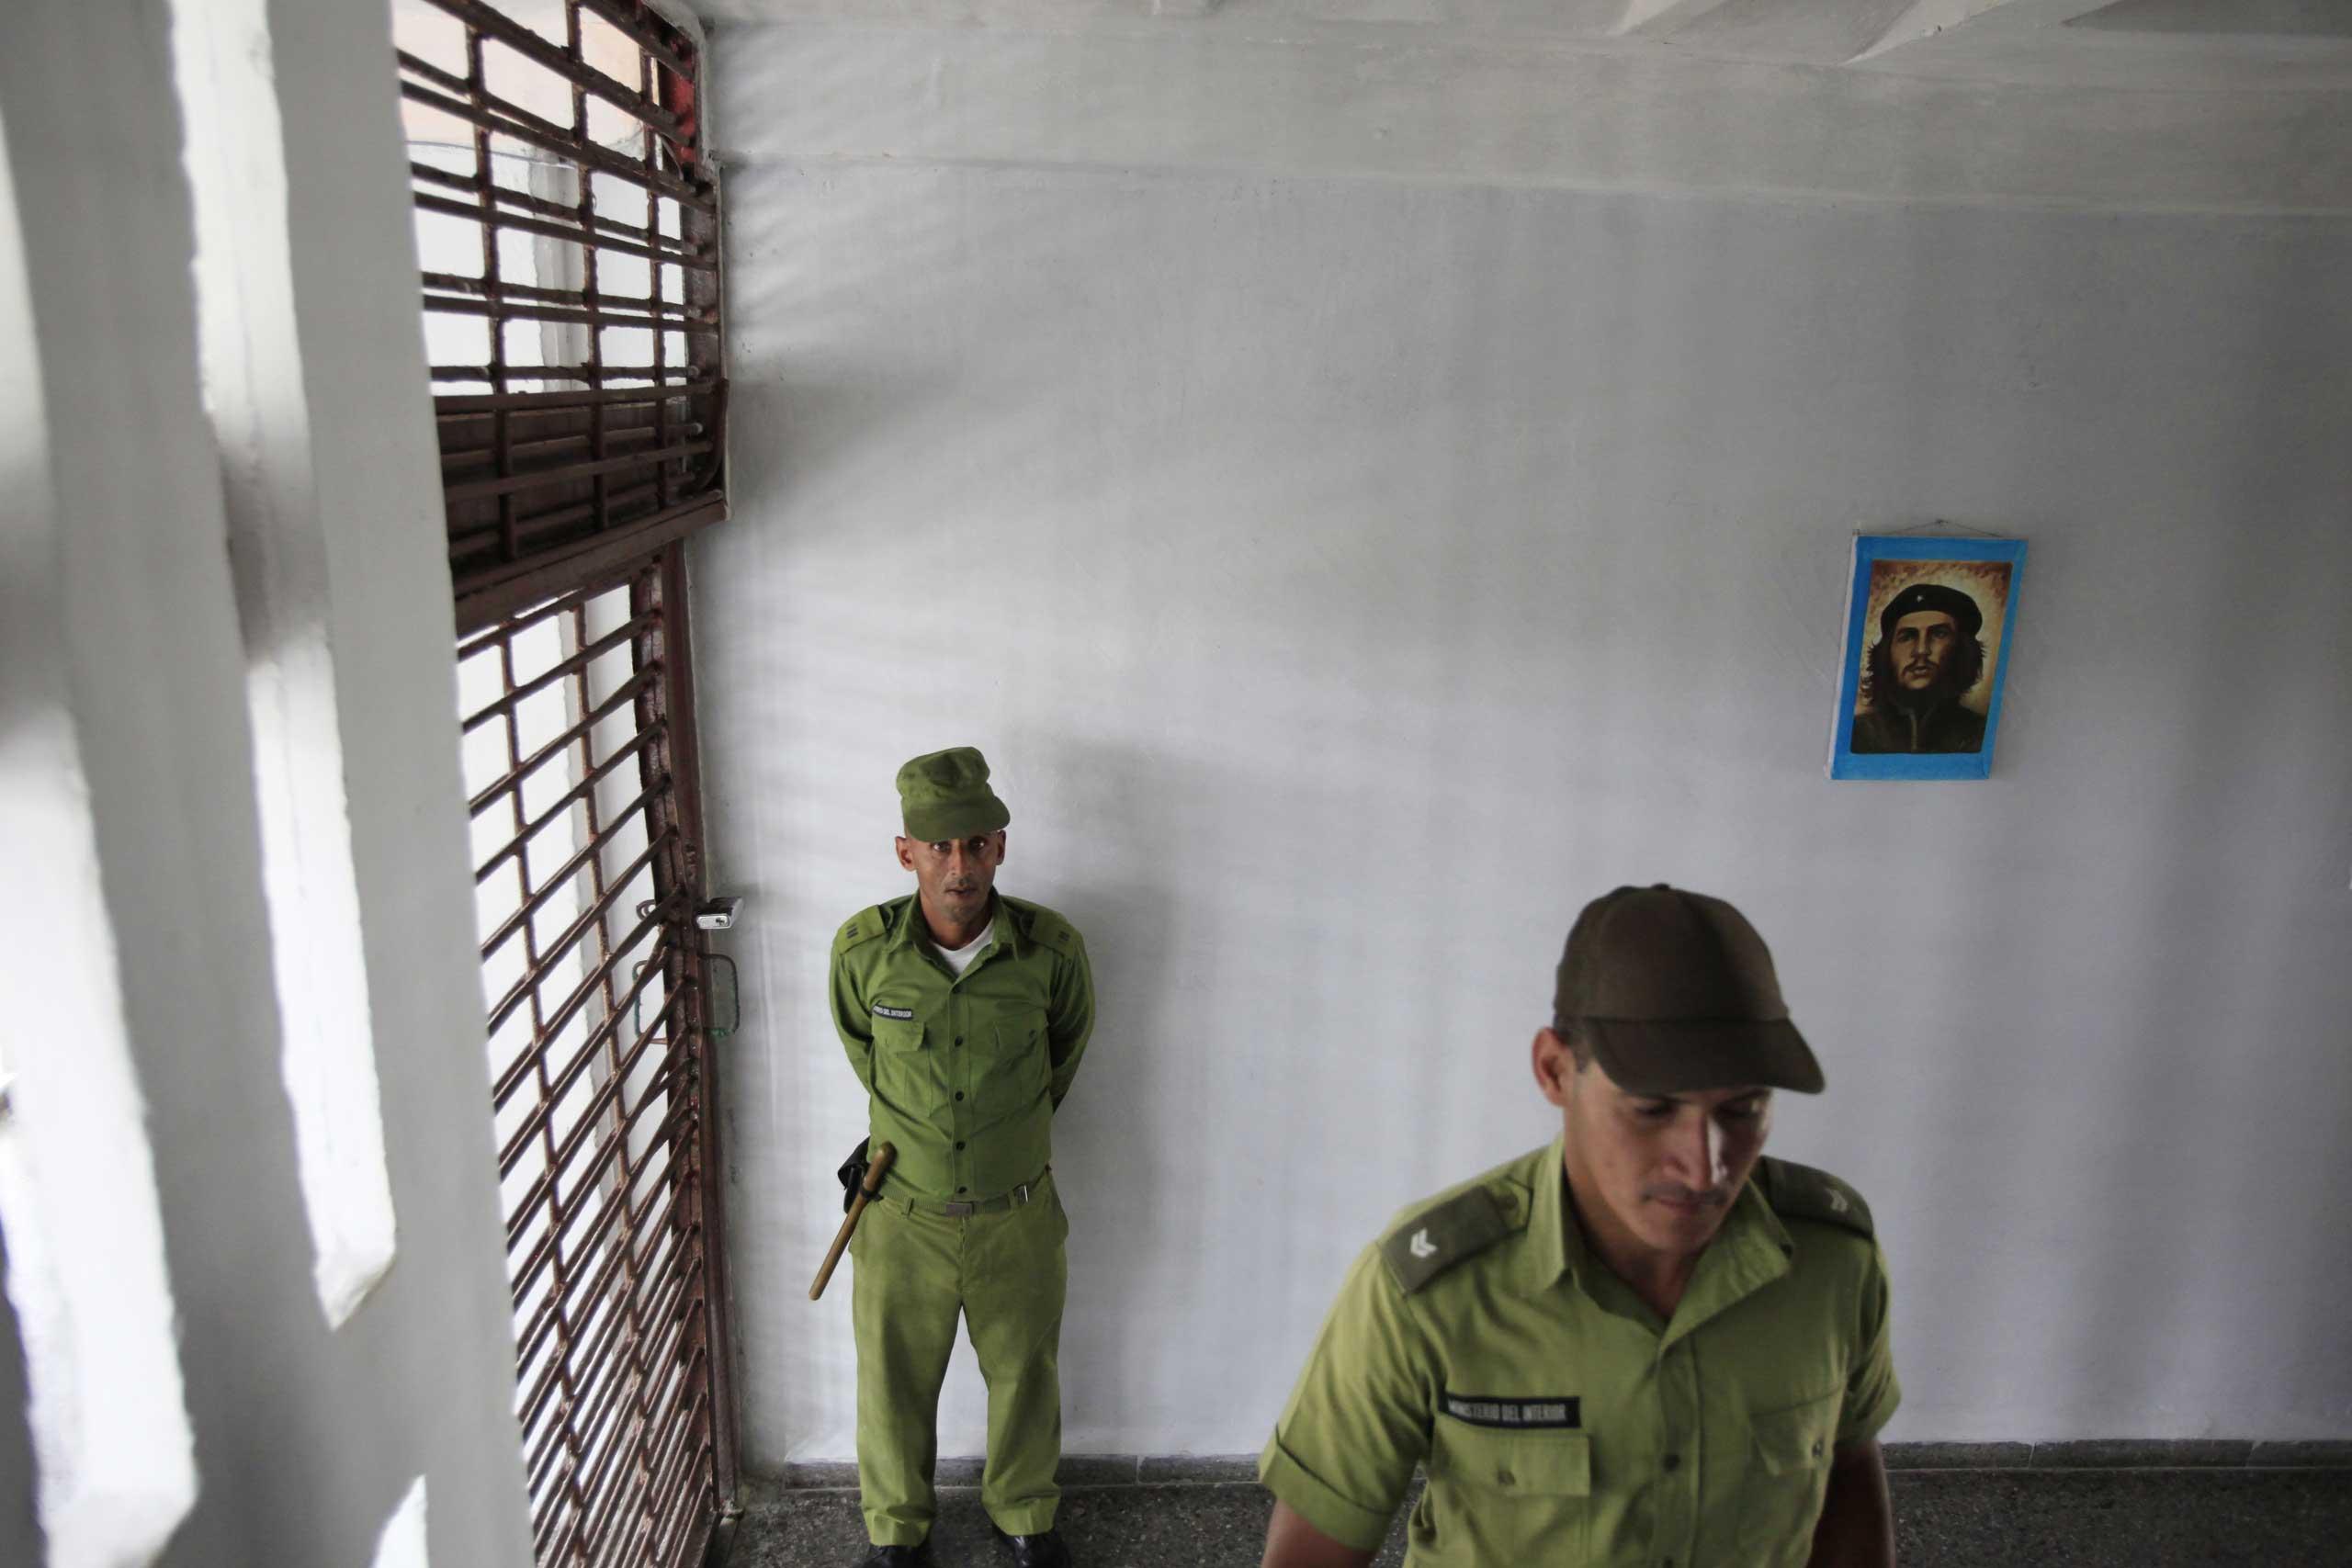 Military guards at the Combinado del Este prison in Havana, Cuba in 2013.